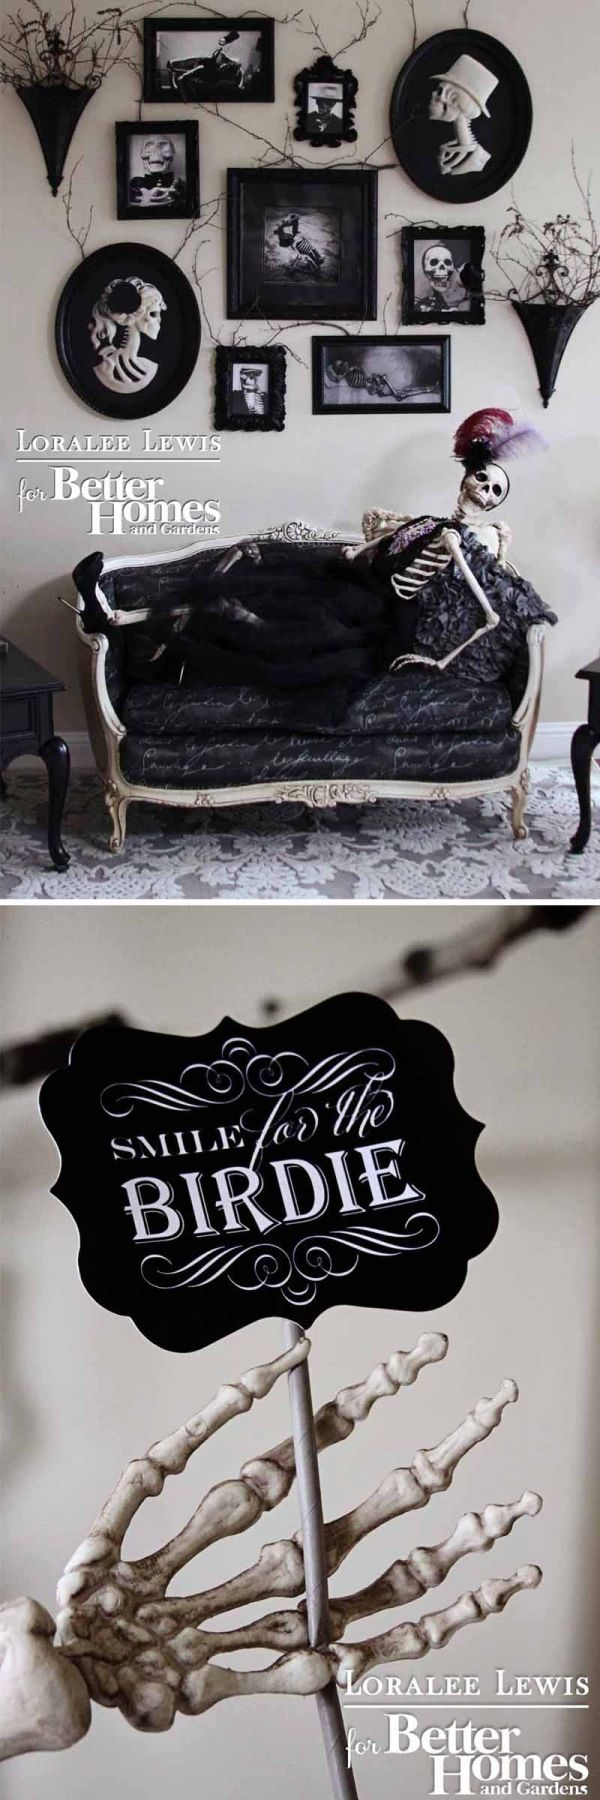 Best 20+ Halloween bridal showers ideas on Pinterest | Bridal ...